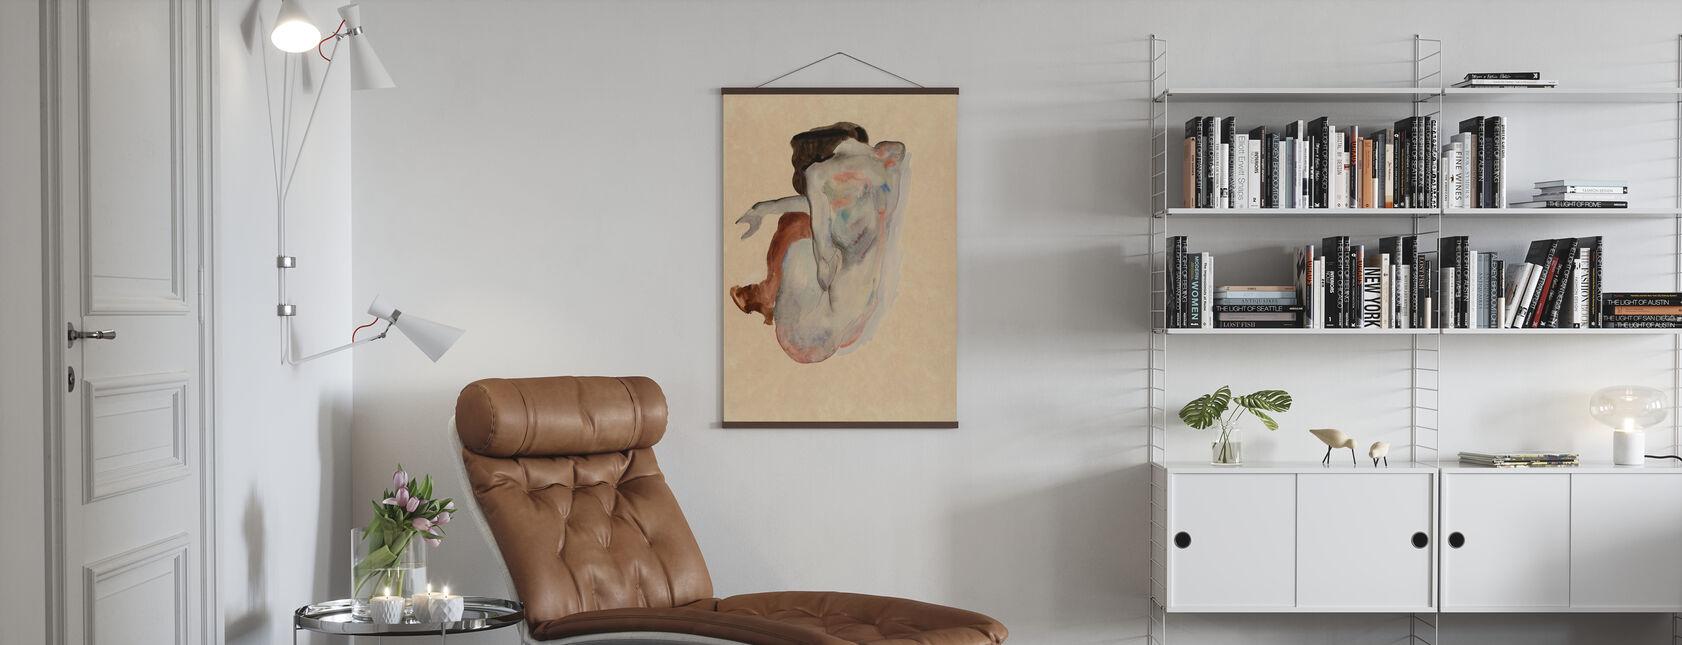 Kruching nøgen - Egon Schiele - Plakat - Stue